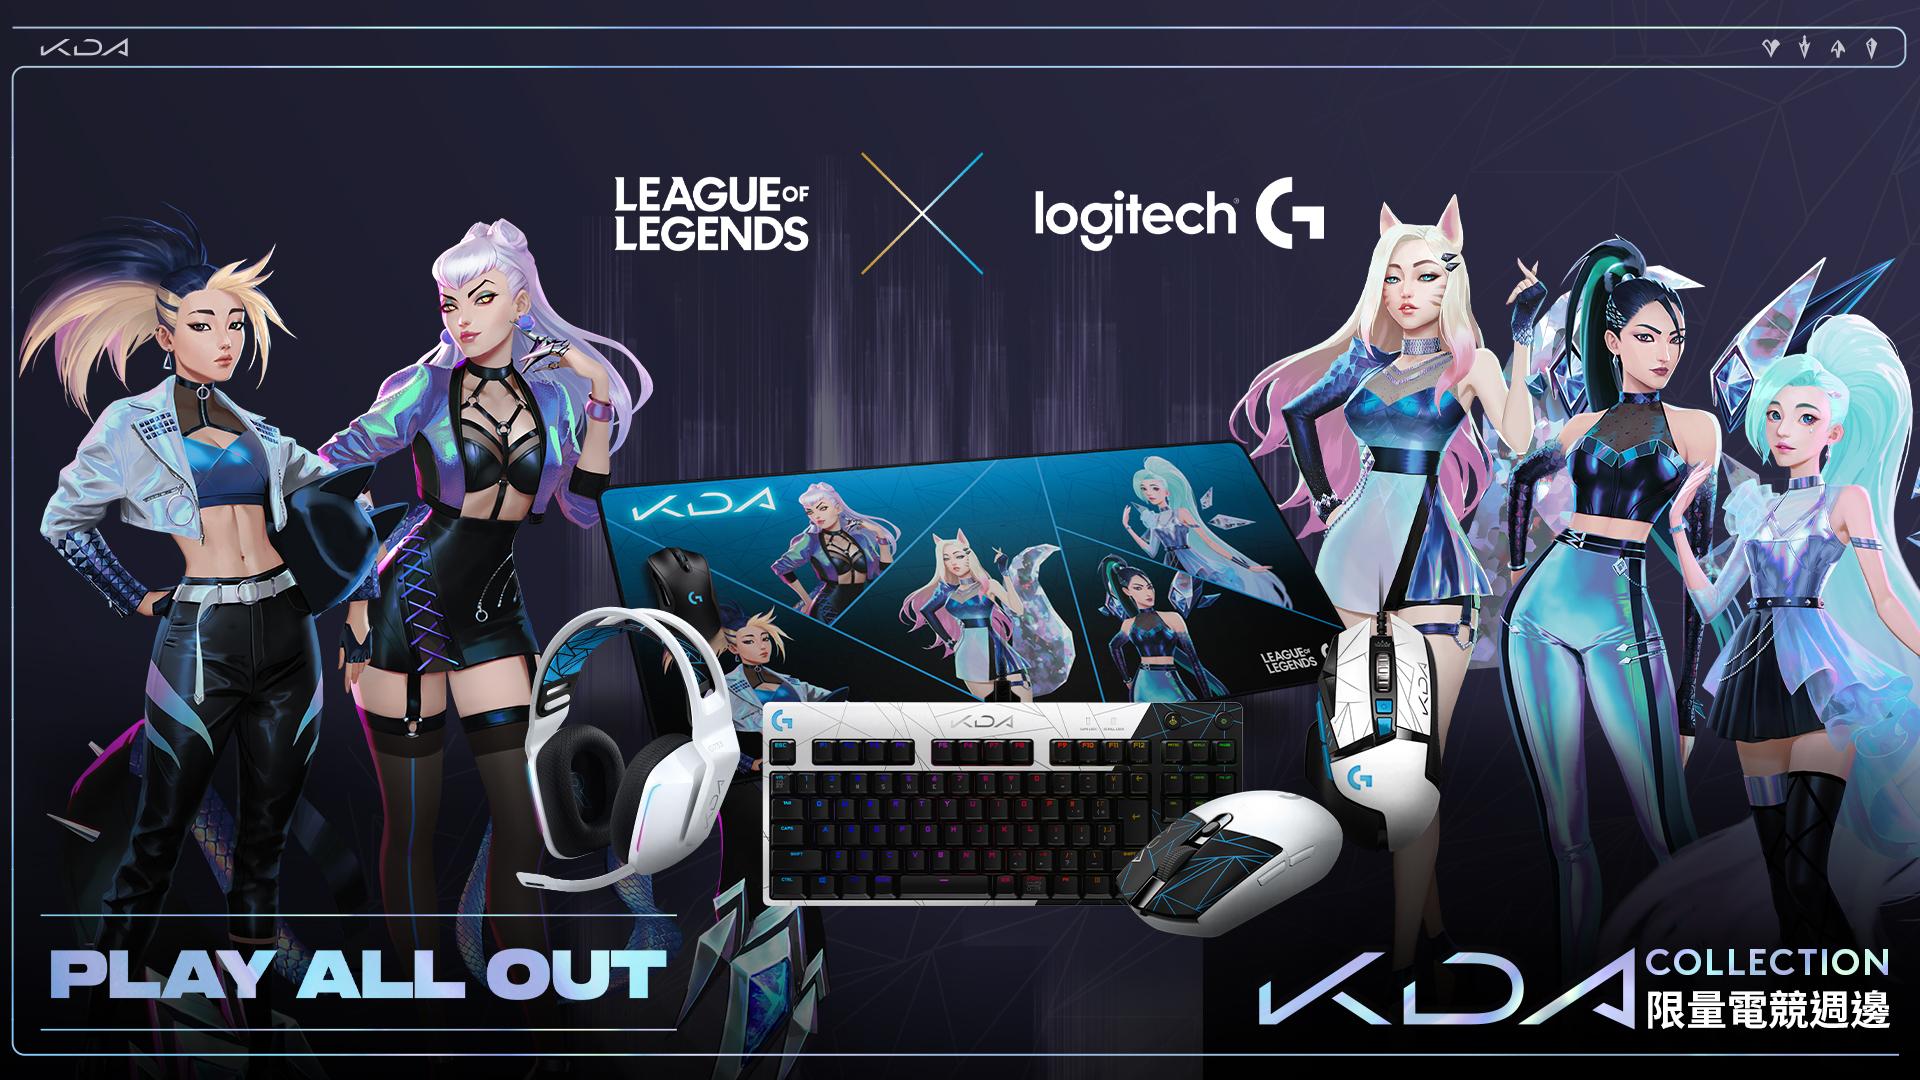 Logitech G x 英雄聯盟